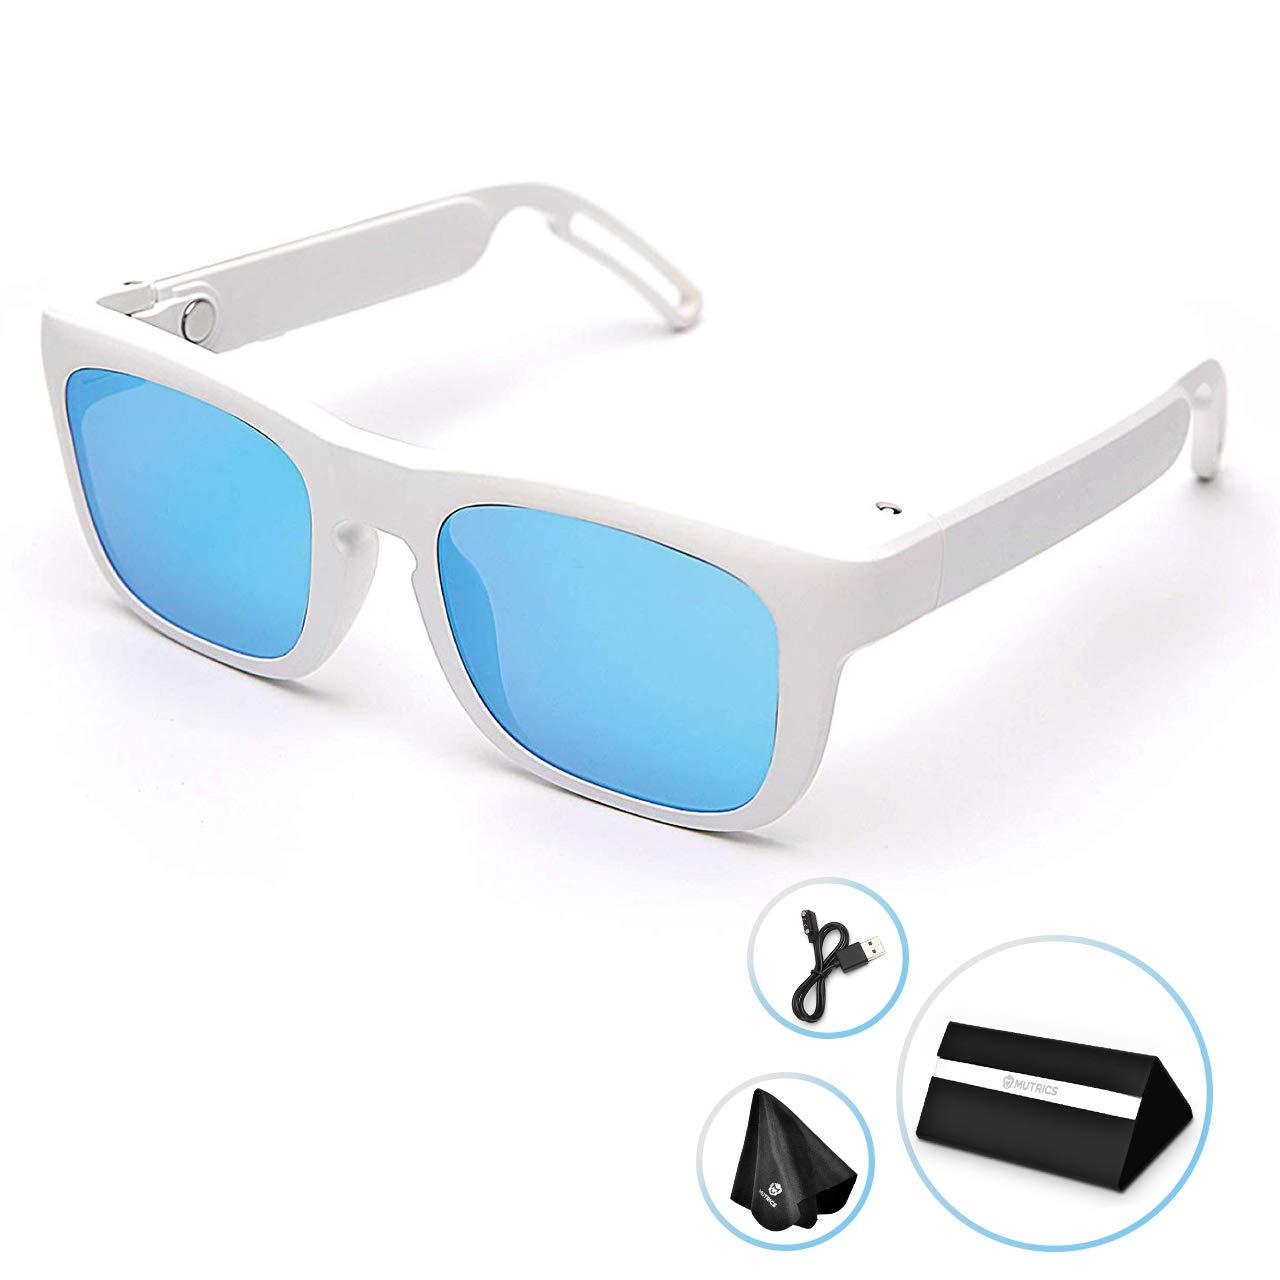 Orange Mutrics Stylish Smart Music Sunglasses with Virtual 5.1 Surround Sound Audio Bluetooth Sunglasses for Men Hands Free Call AI Voice Control UV 400 Polarized Lens /& IP56 Sweat Resistant